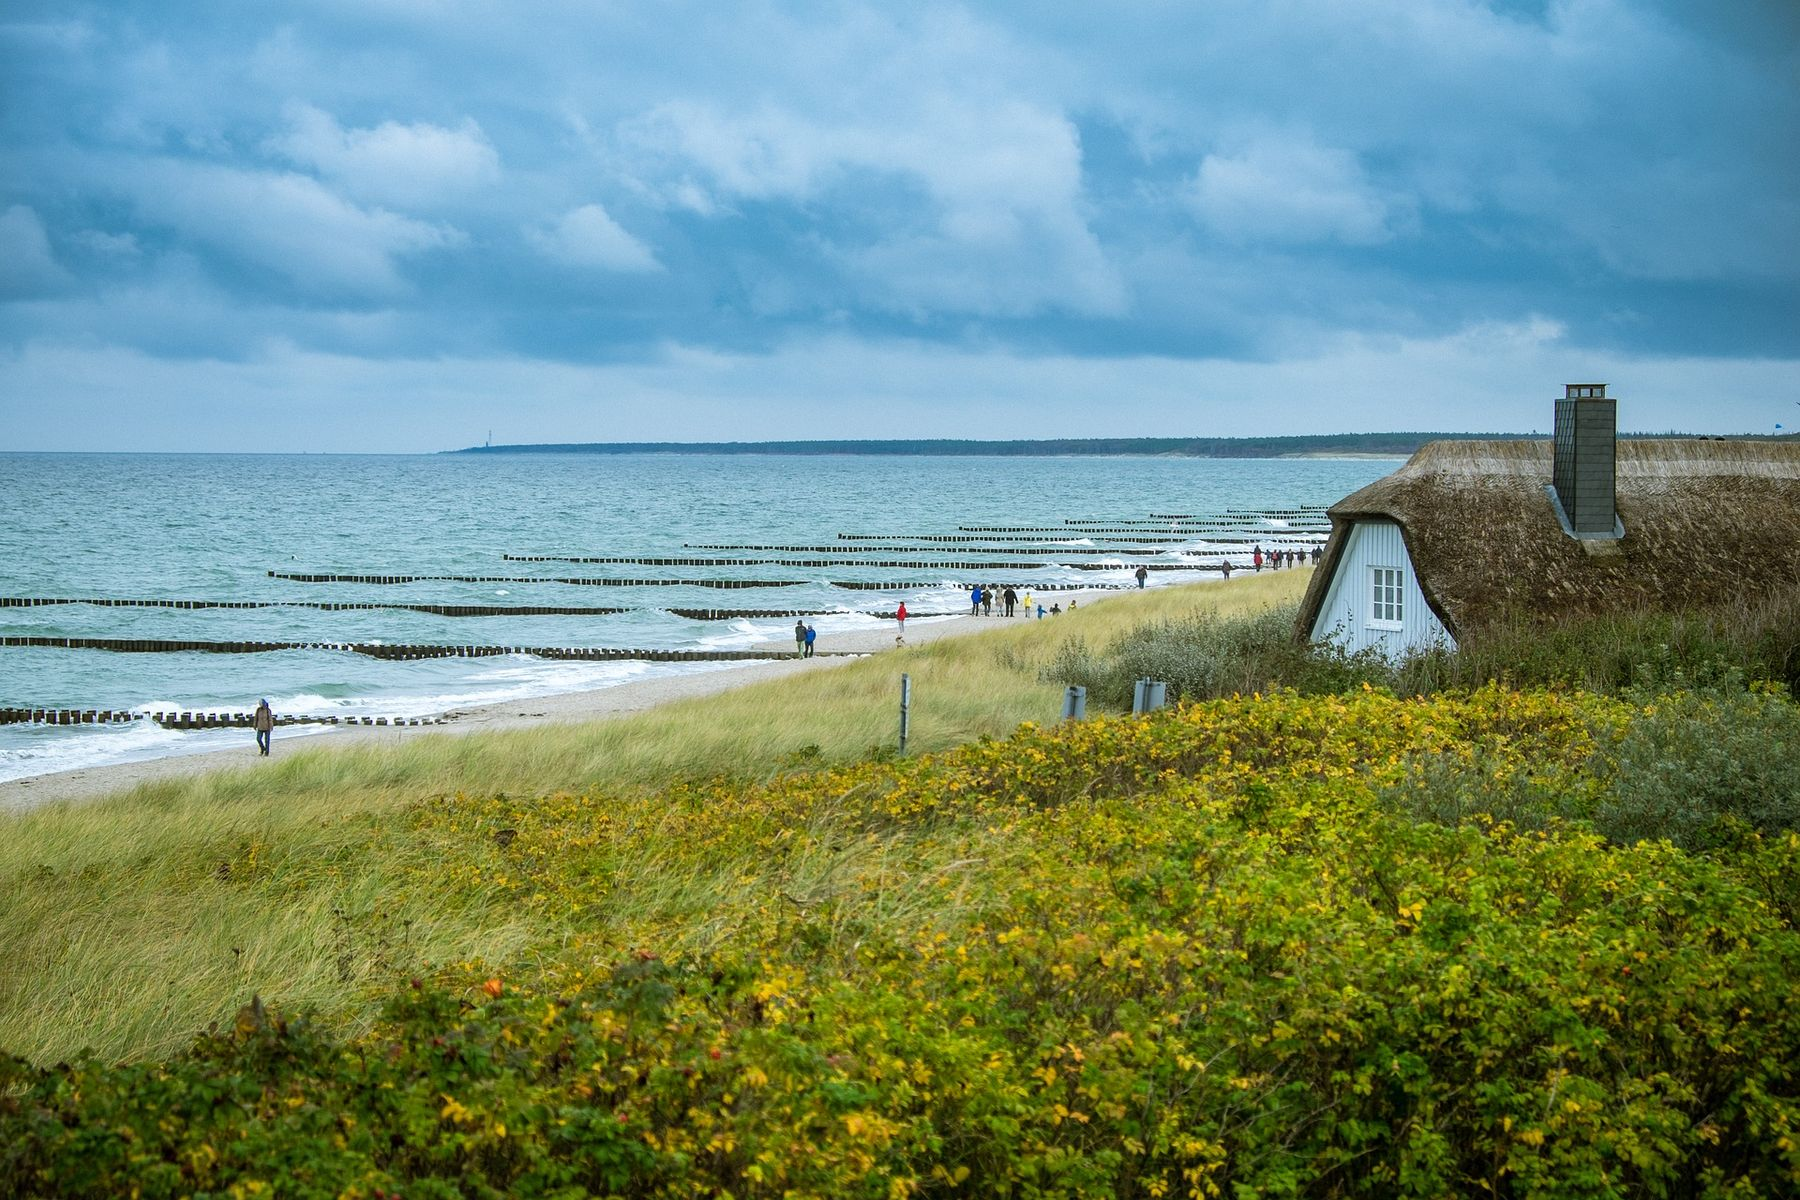 Mooie plaatsen Duitsland Ahrenshoop in Mecklenburg-Vorpommern